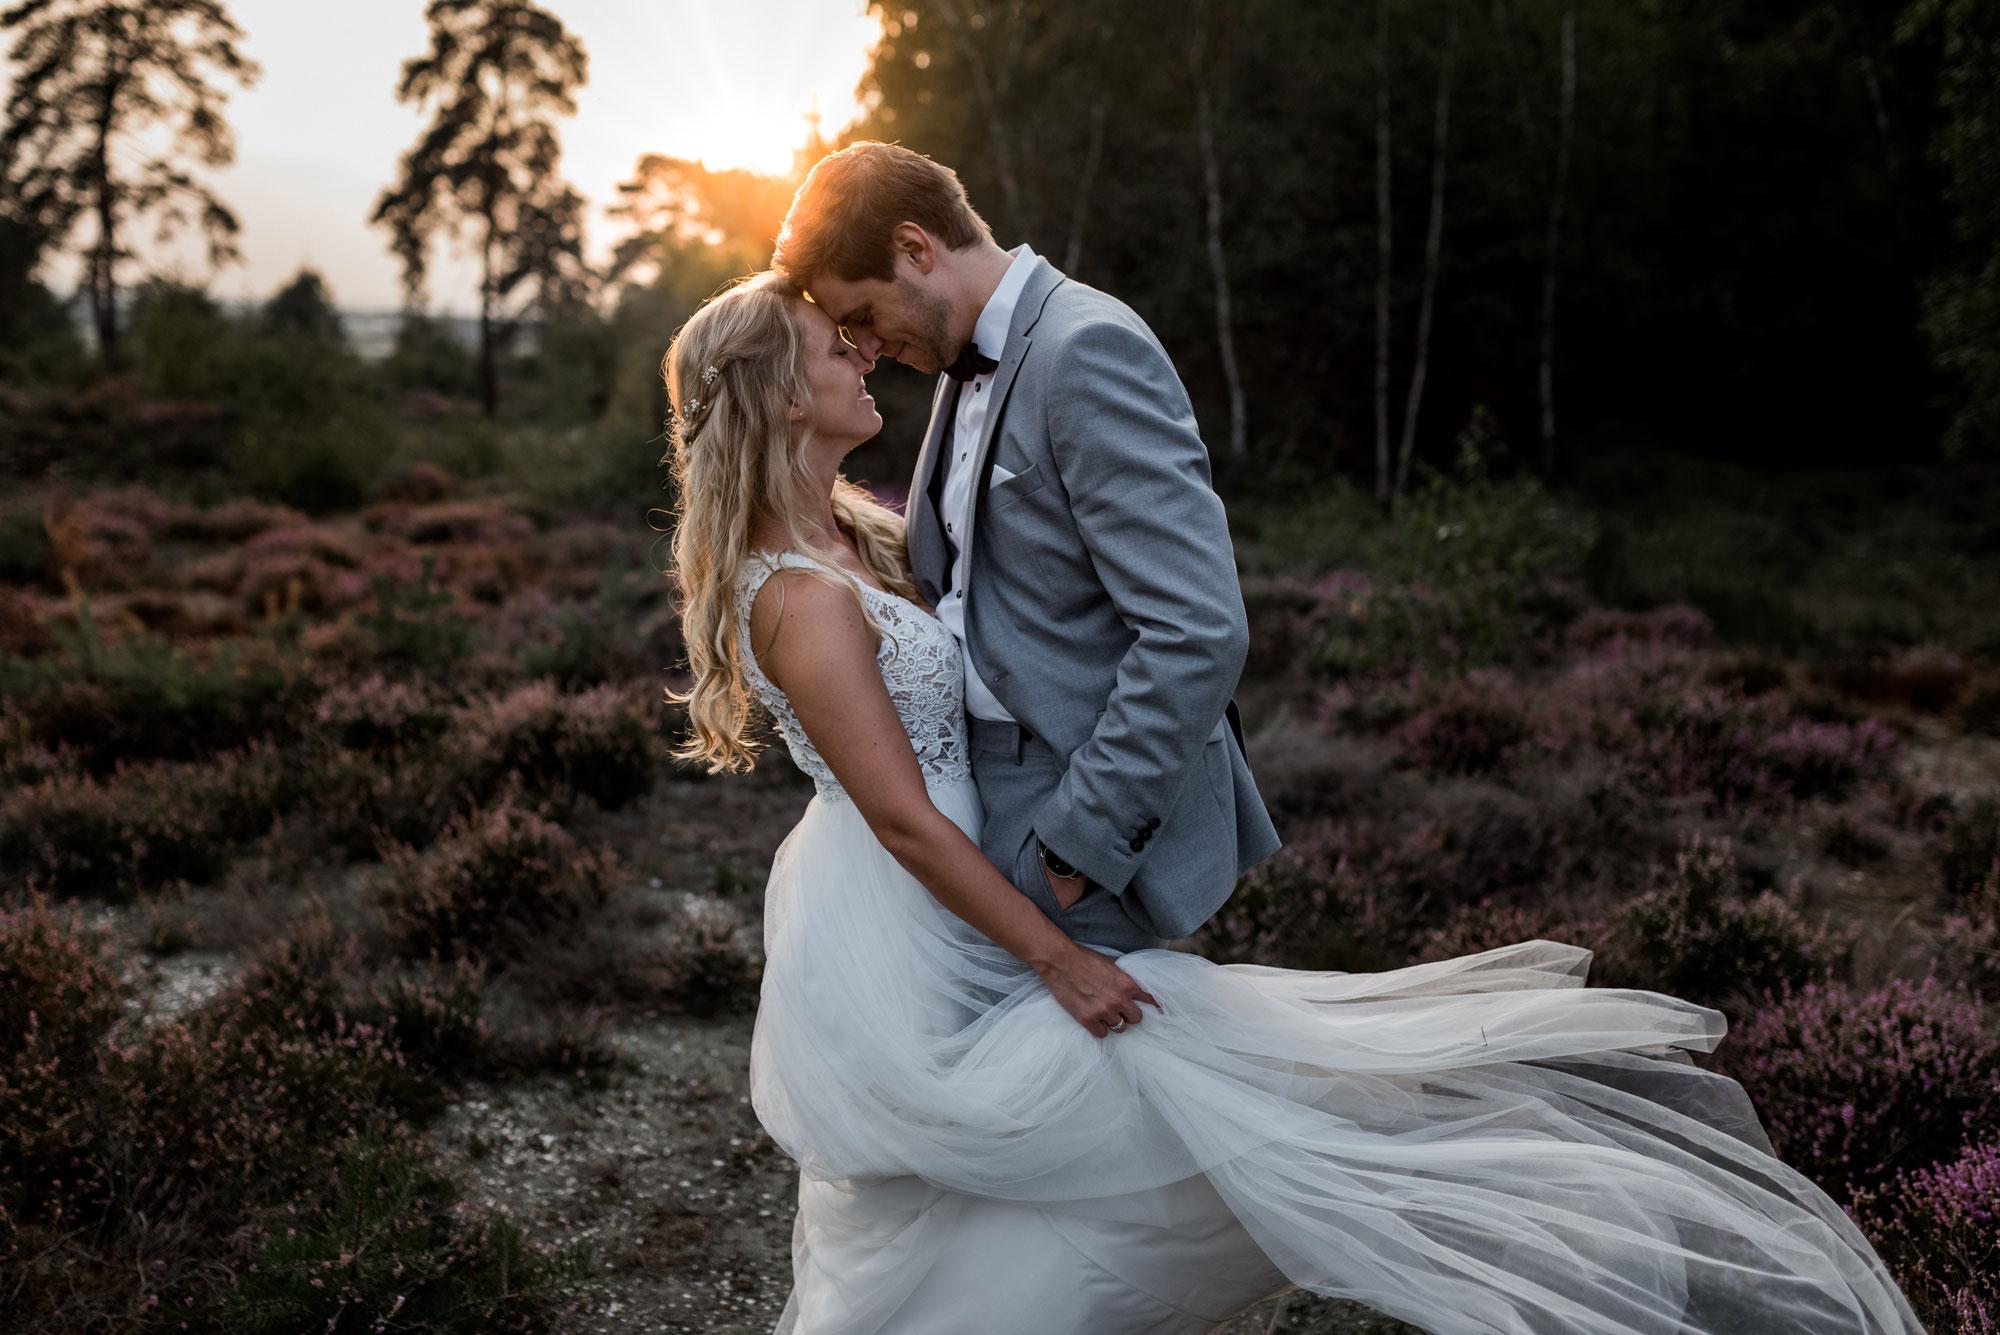 Janine & Sebi - After Wedding Shooting in der Wahner Heide